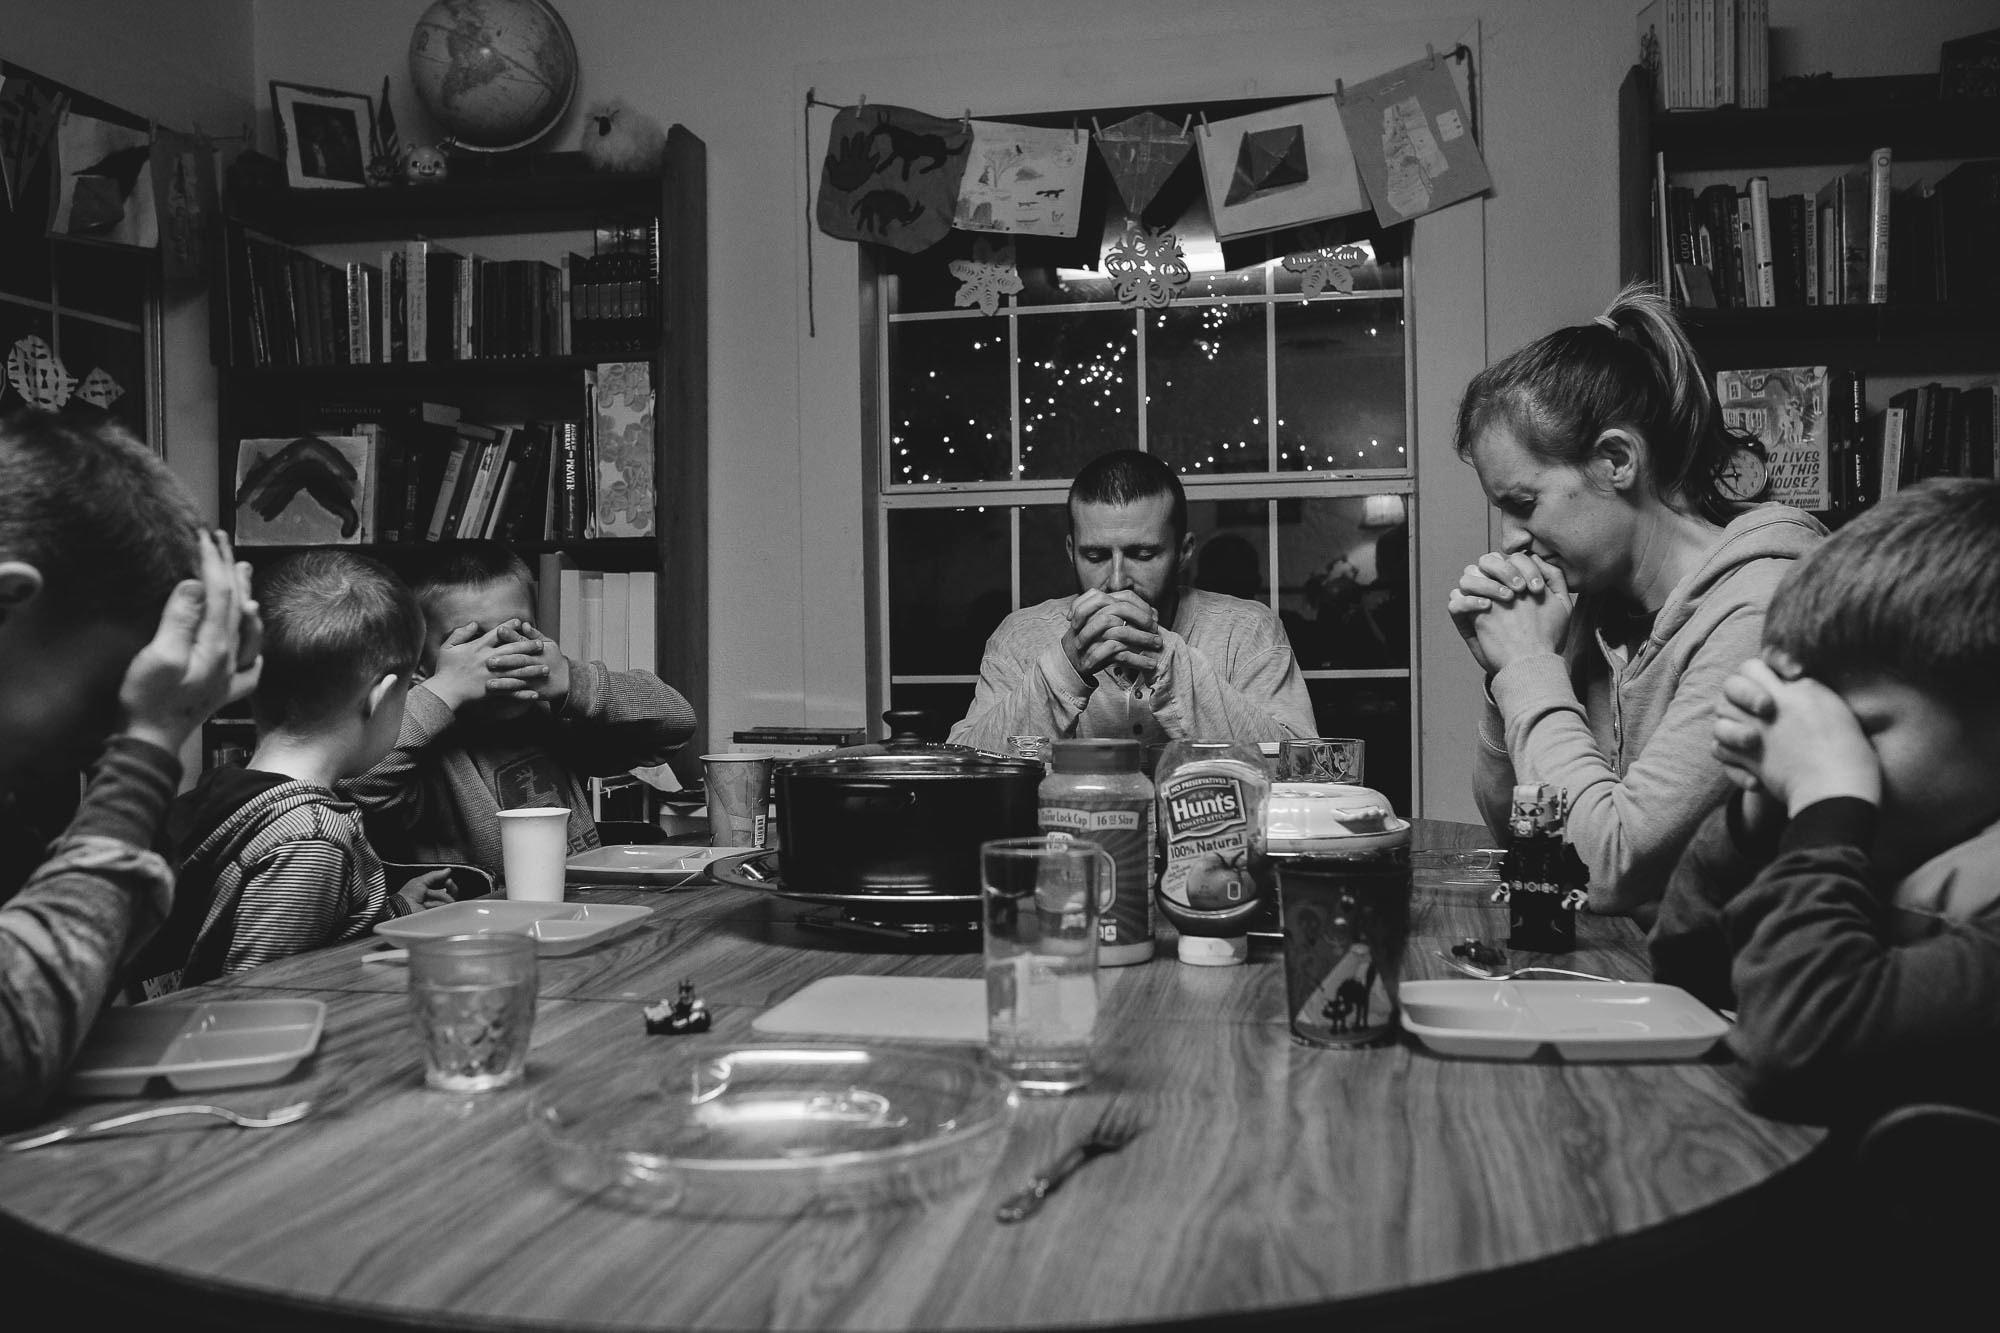 family praying at night before dinner